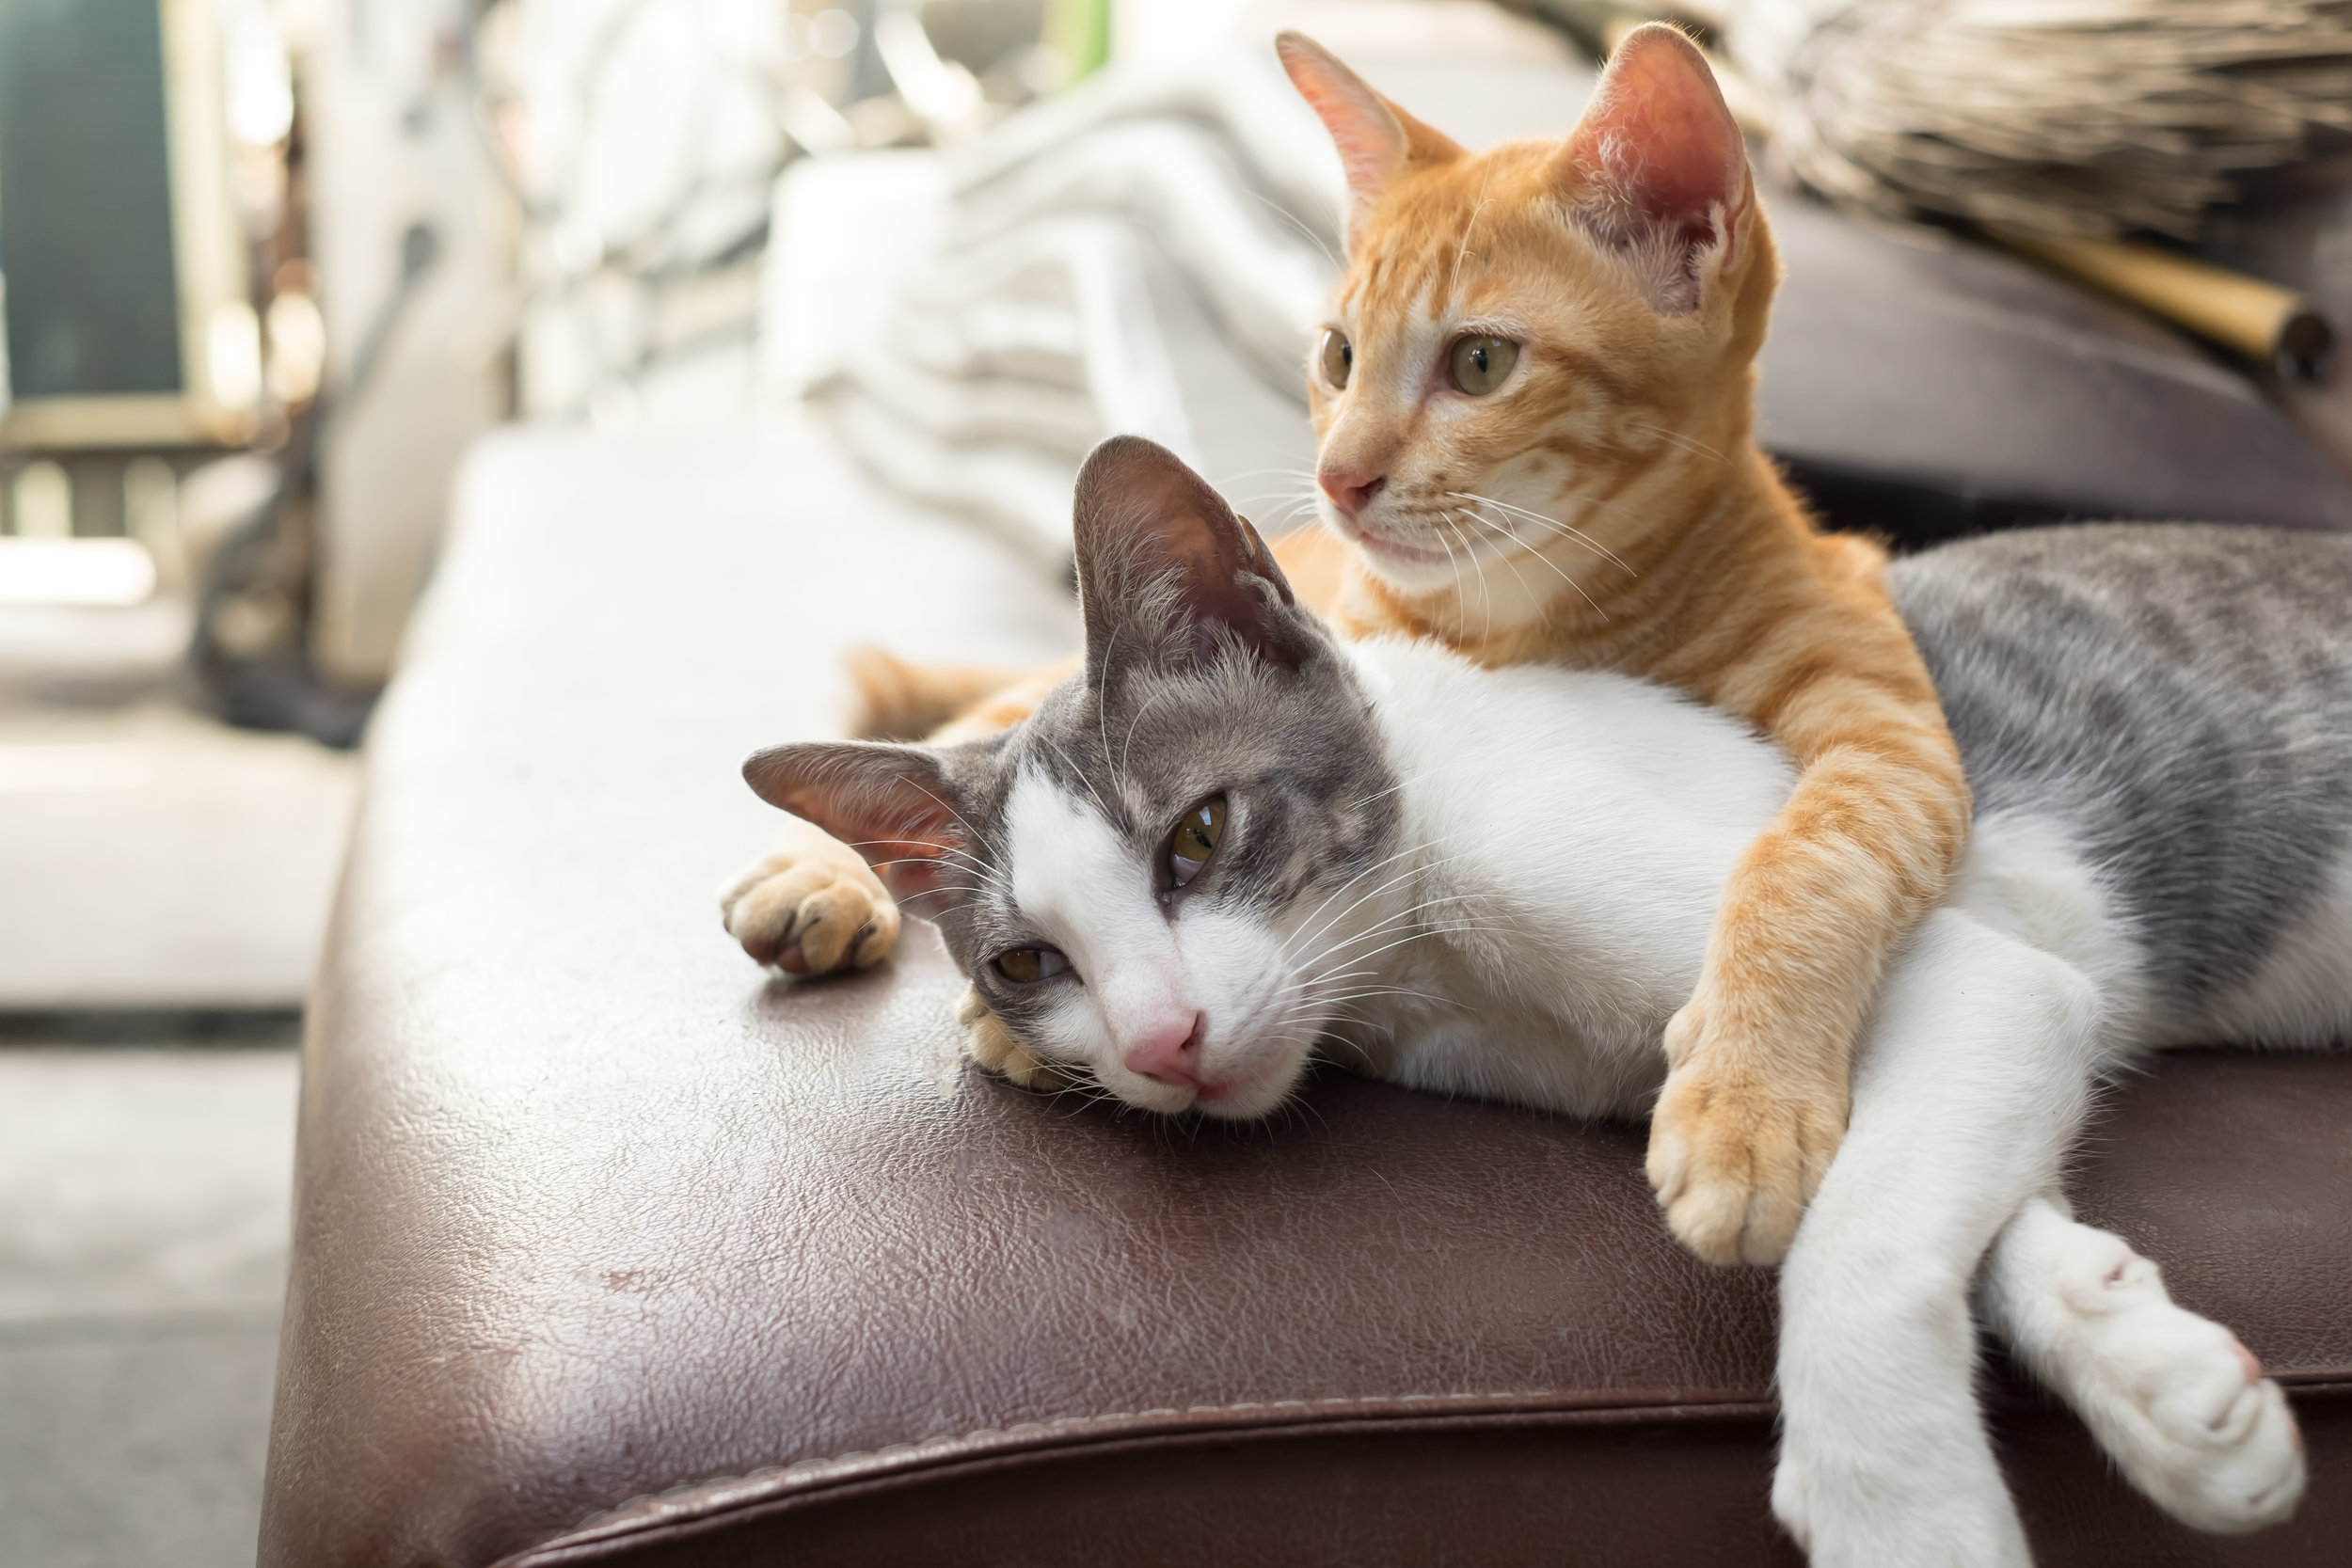 Cats-486495402_4896x3264.jpeg